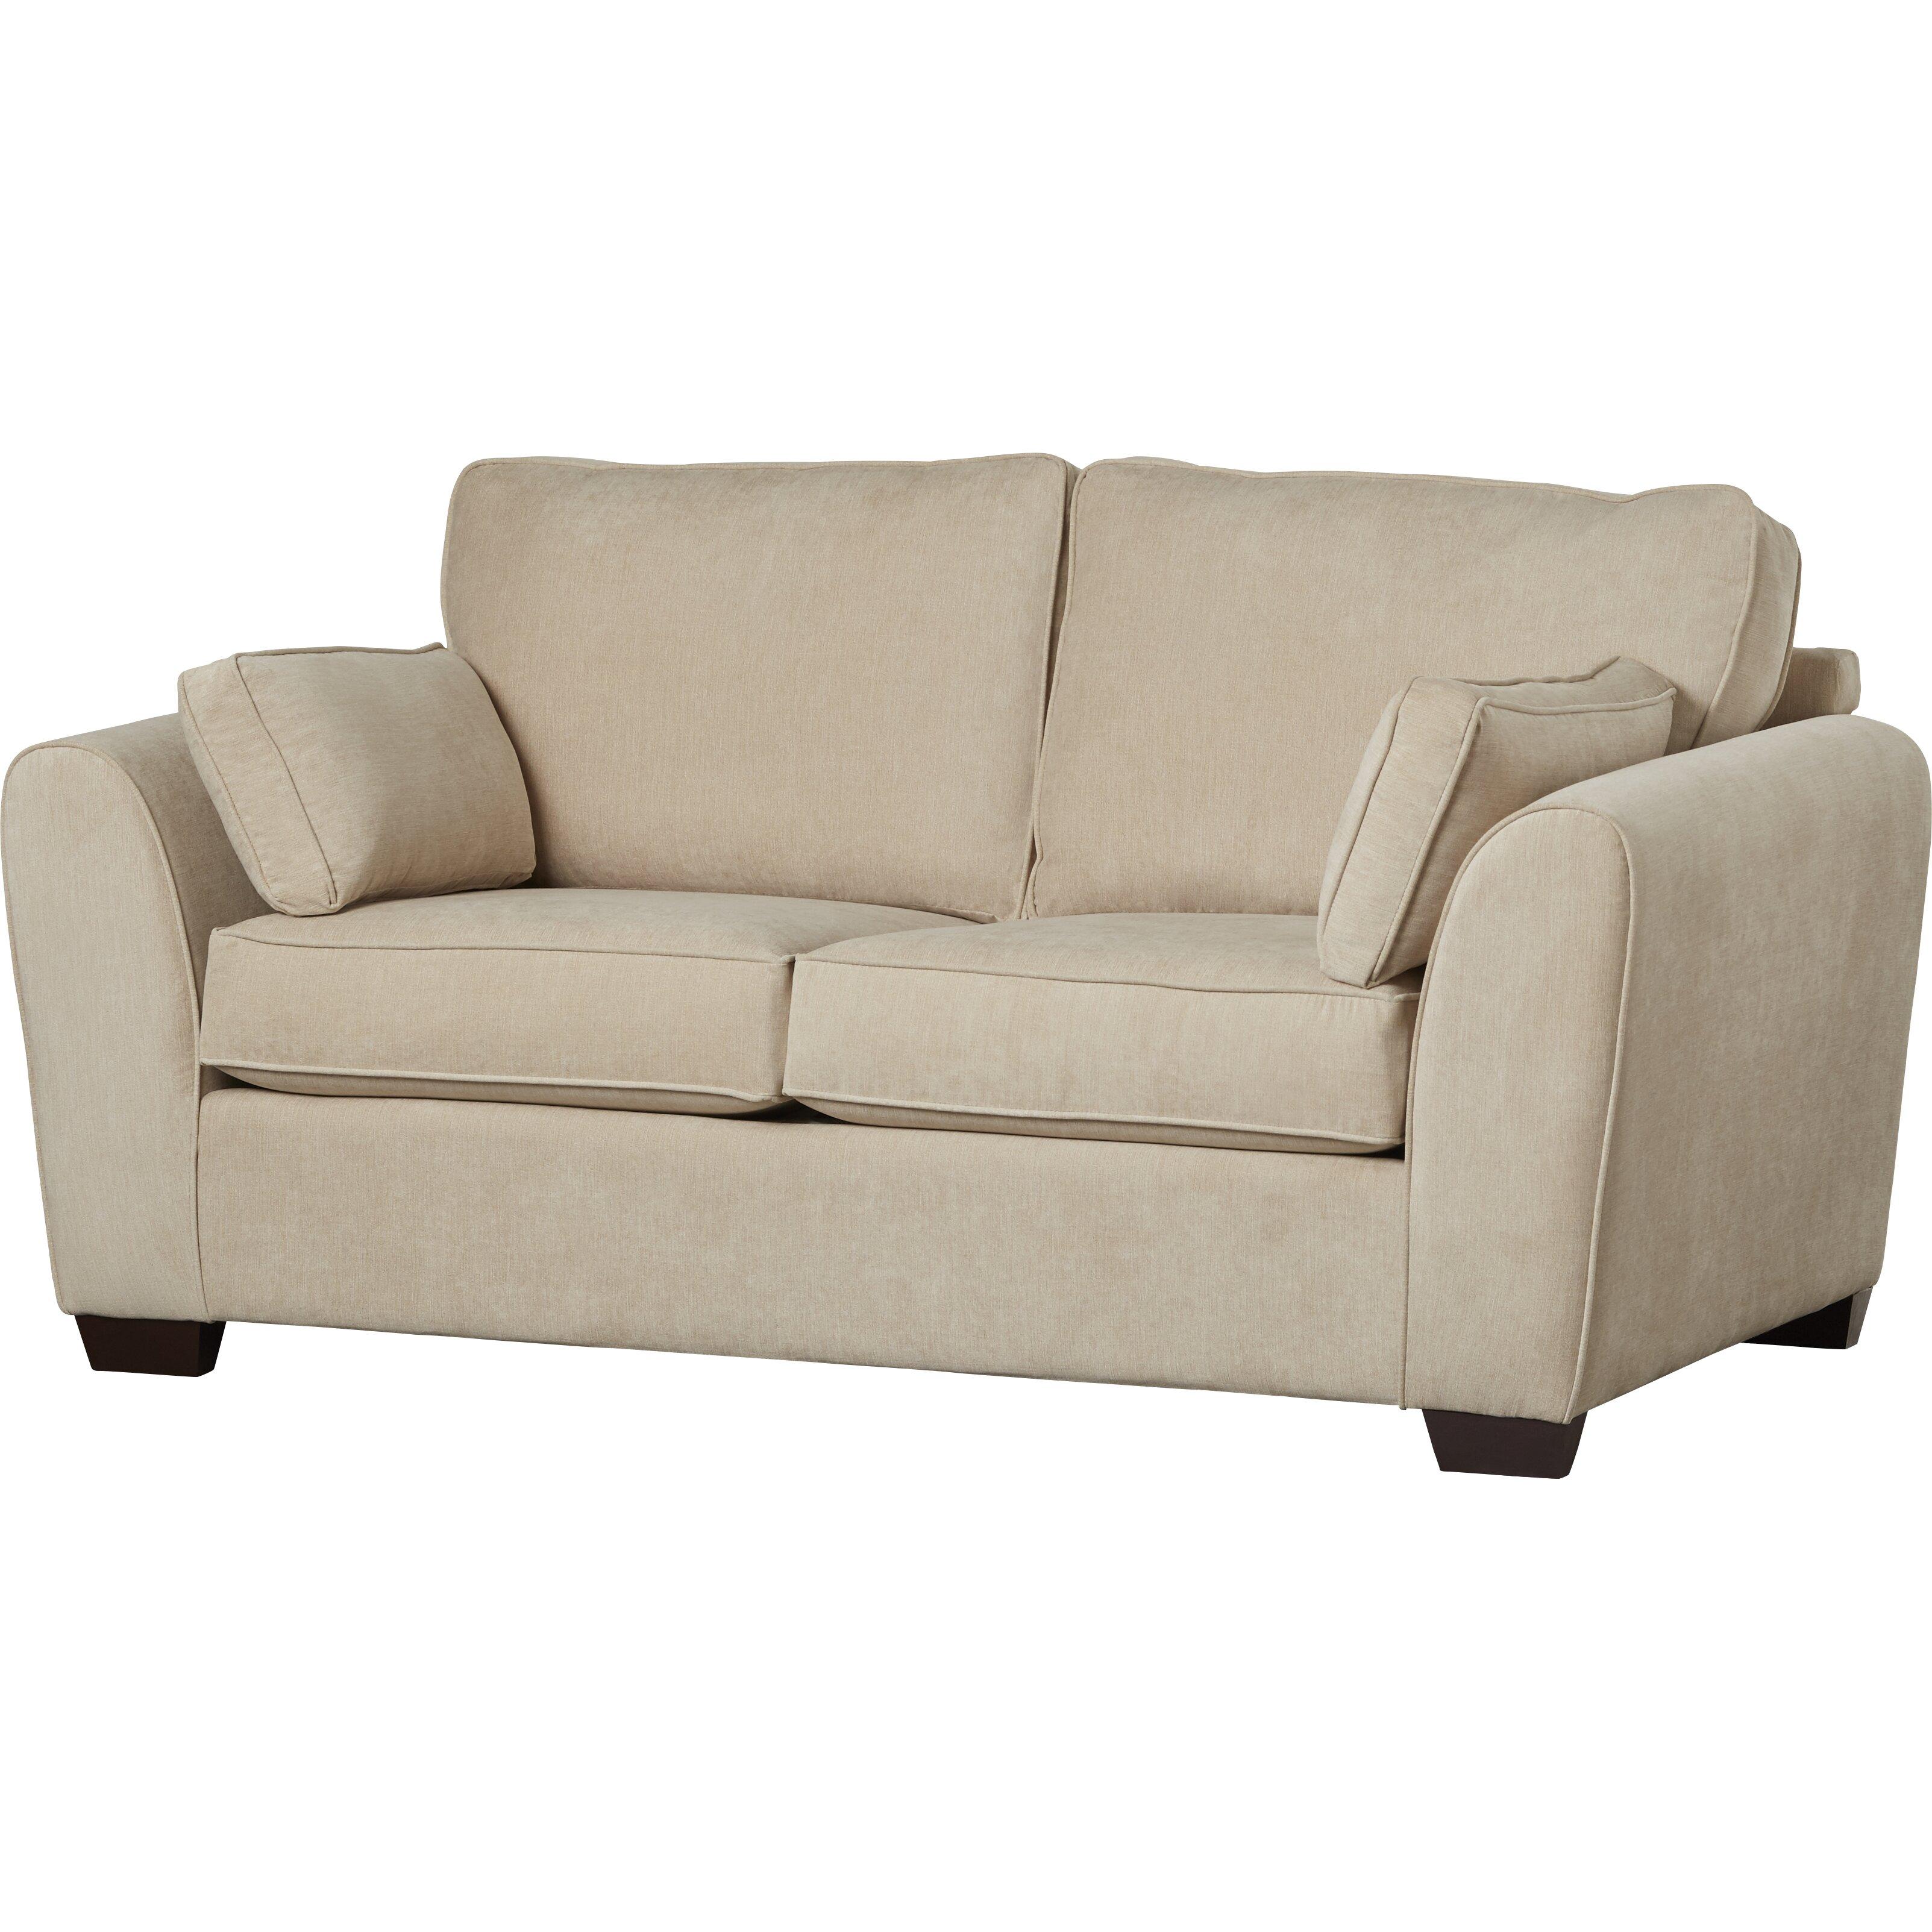 mercury row virginis 2 seater sofa bed reviews wayfair uk. Black Bedroom Furniture Sets. Home Design Ideas